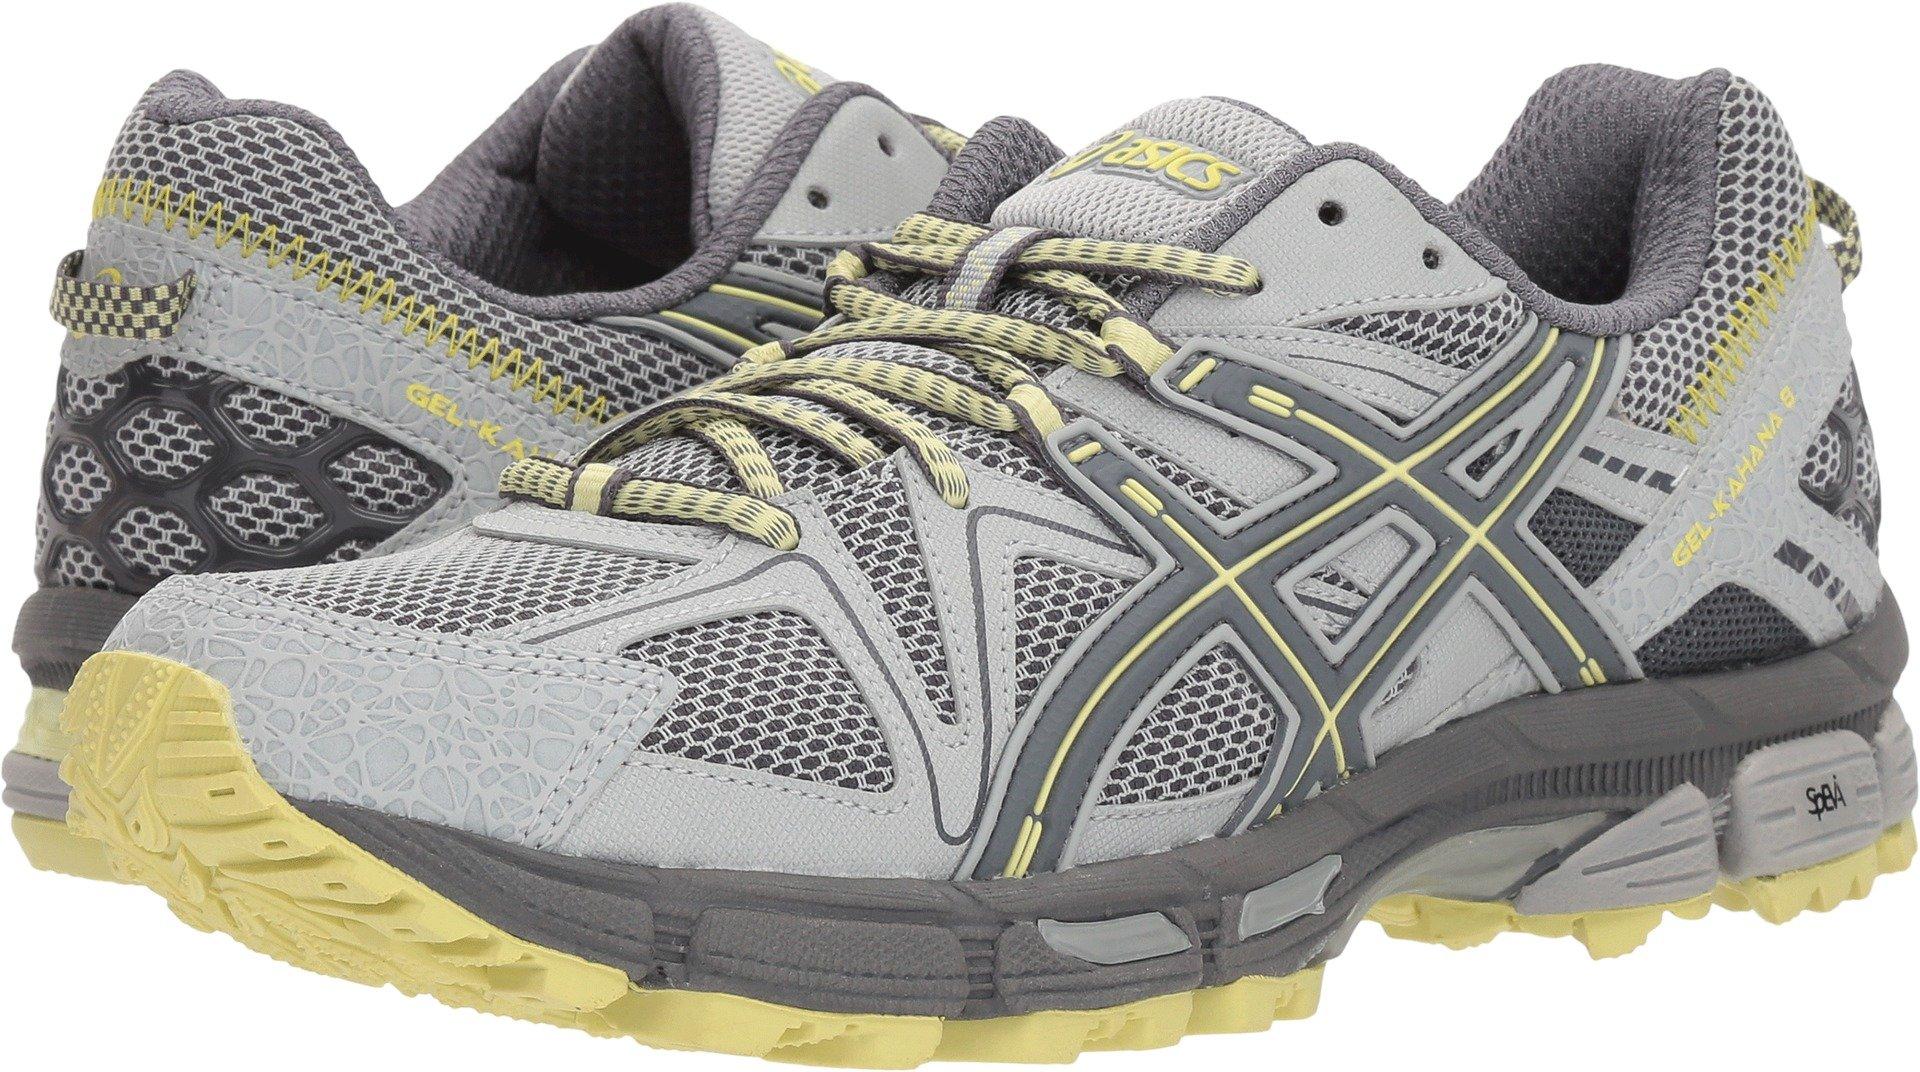 ASICS Gel-Kahana 8 Trail Running Shoes - Women's, Mid Grey/Carbon/Limelight, Medium, T6L5N.9697-10 by ASICS